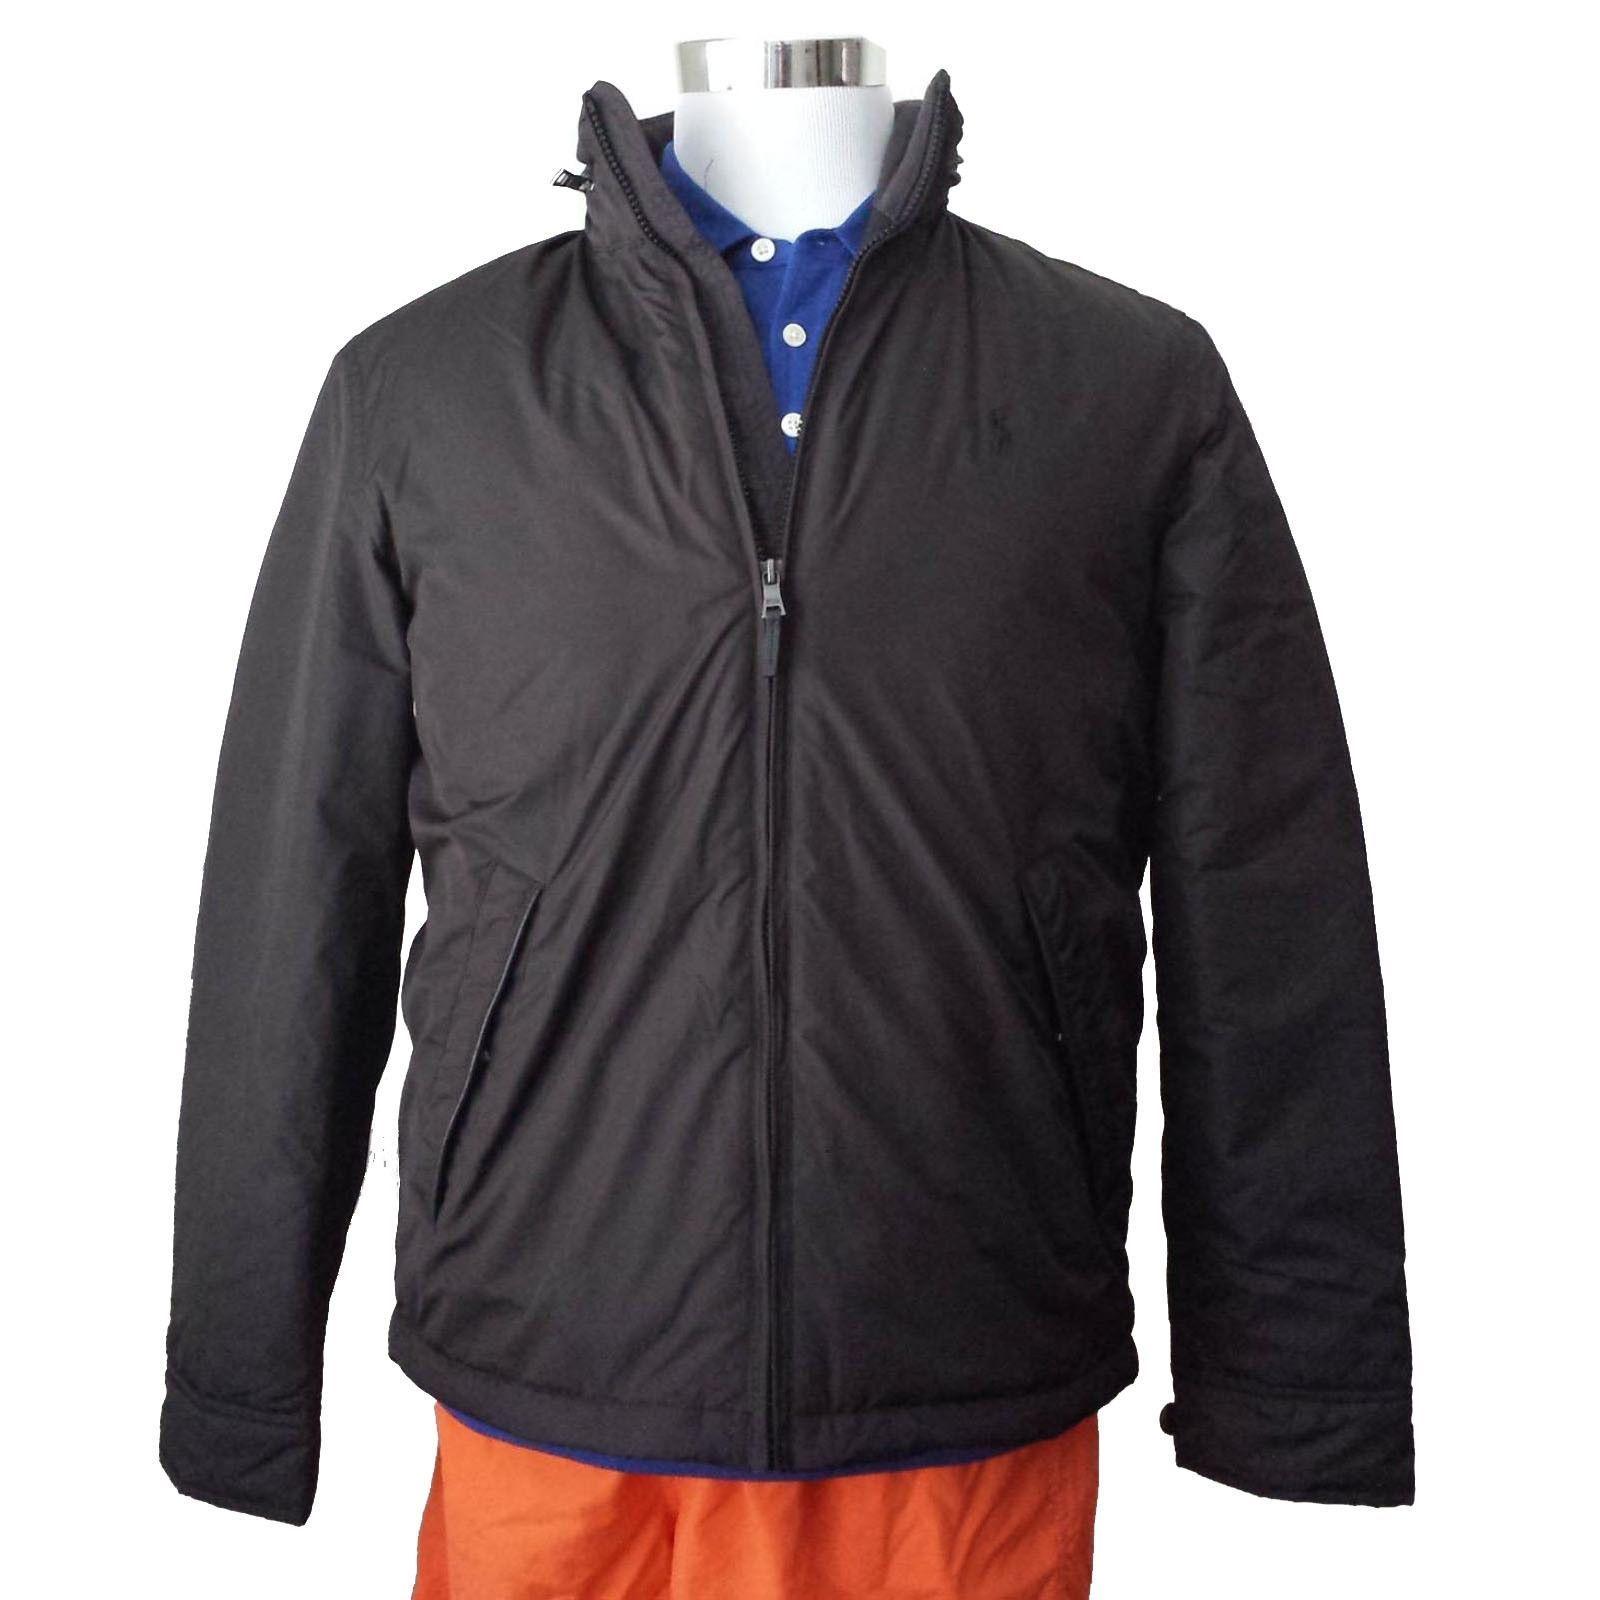 #cloth shoes boots POLO Ralph Lauren Men Size S Black jacket Nylon shell  Fleece Lining